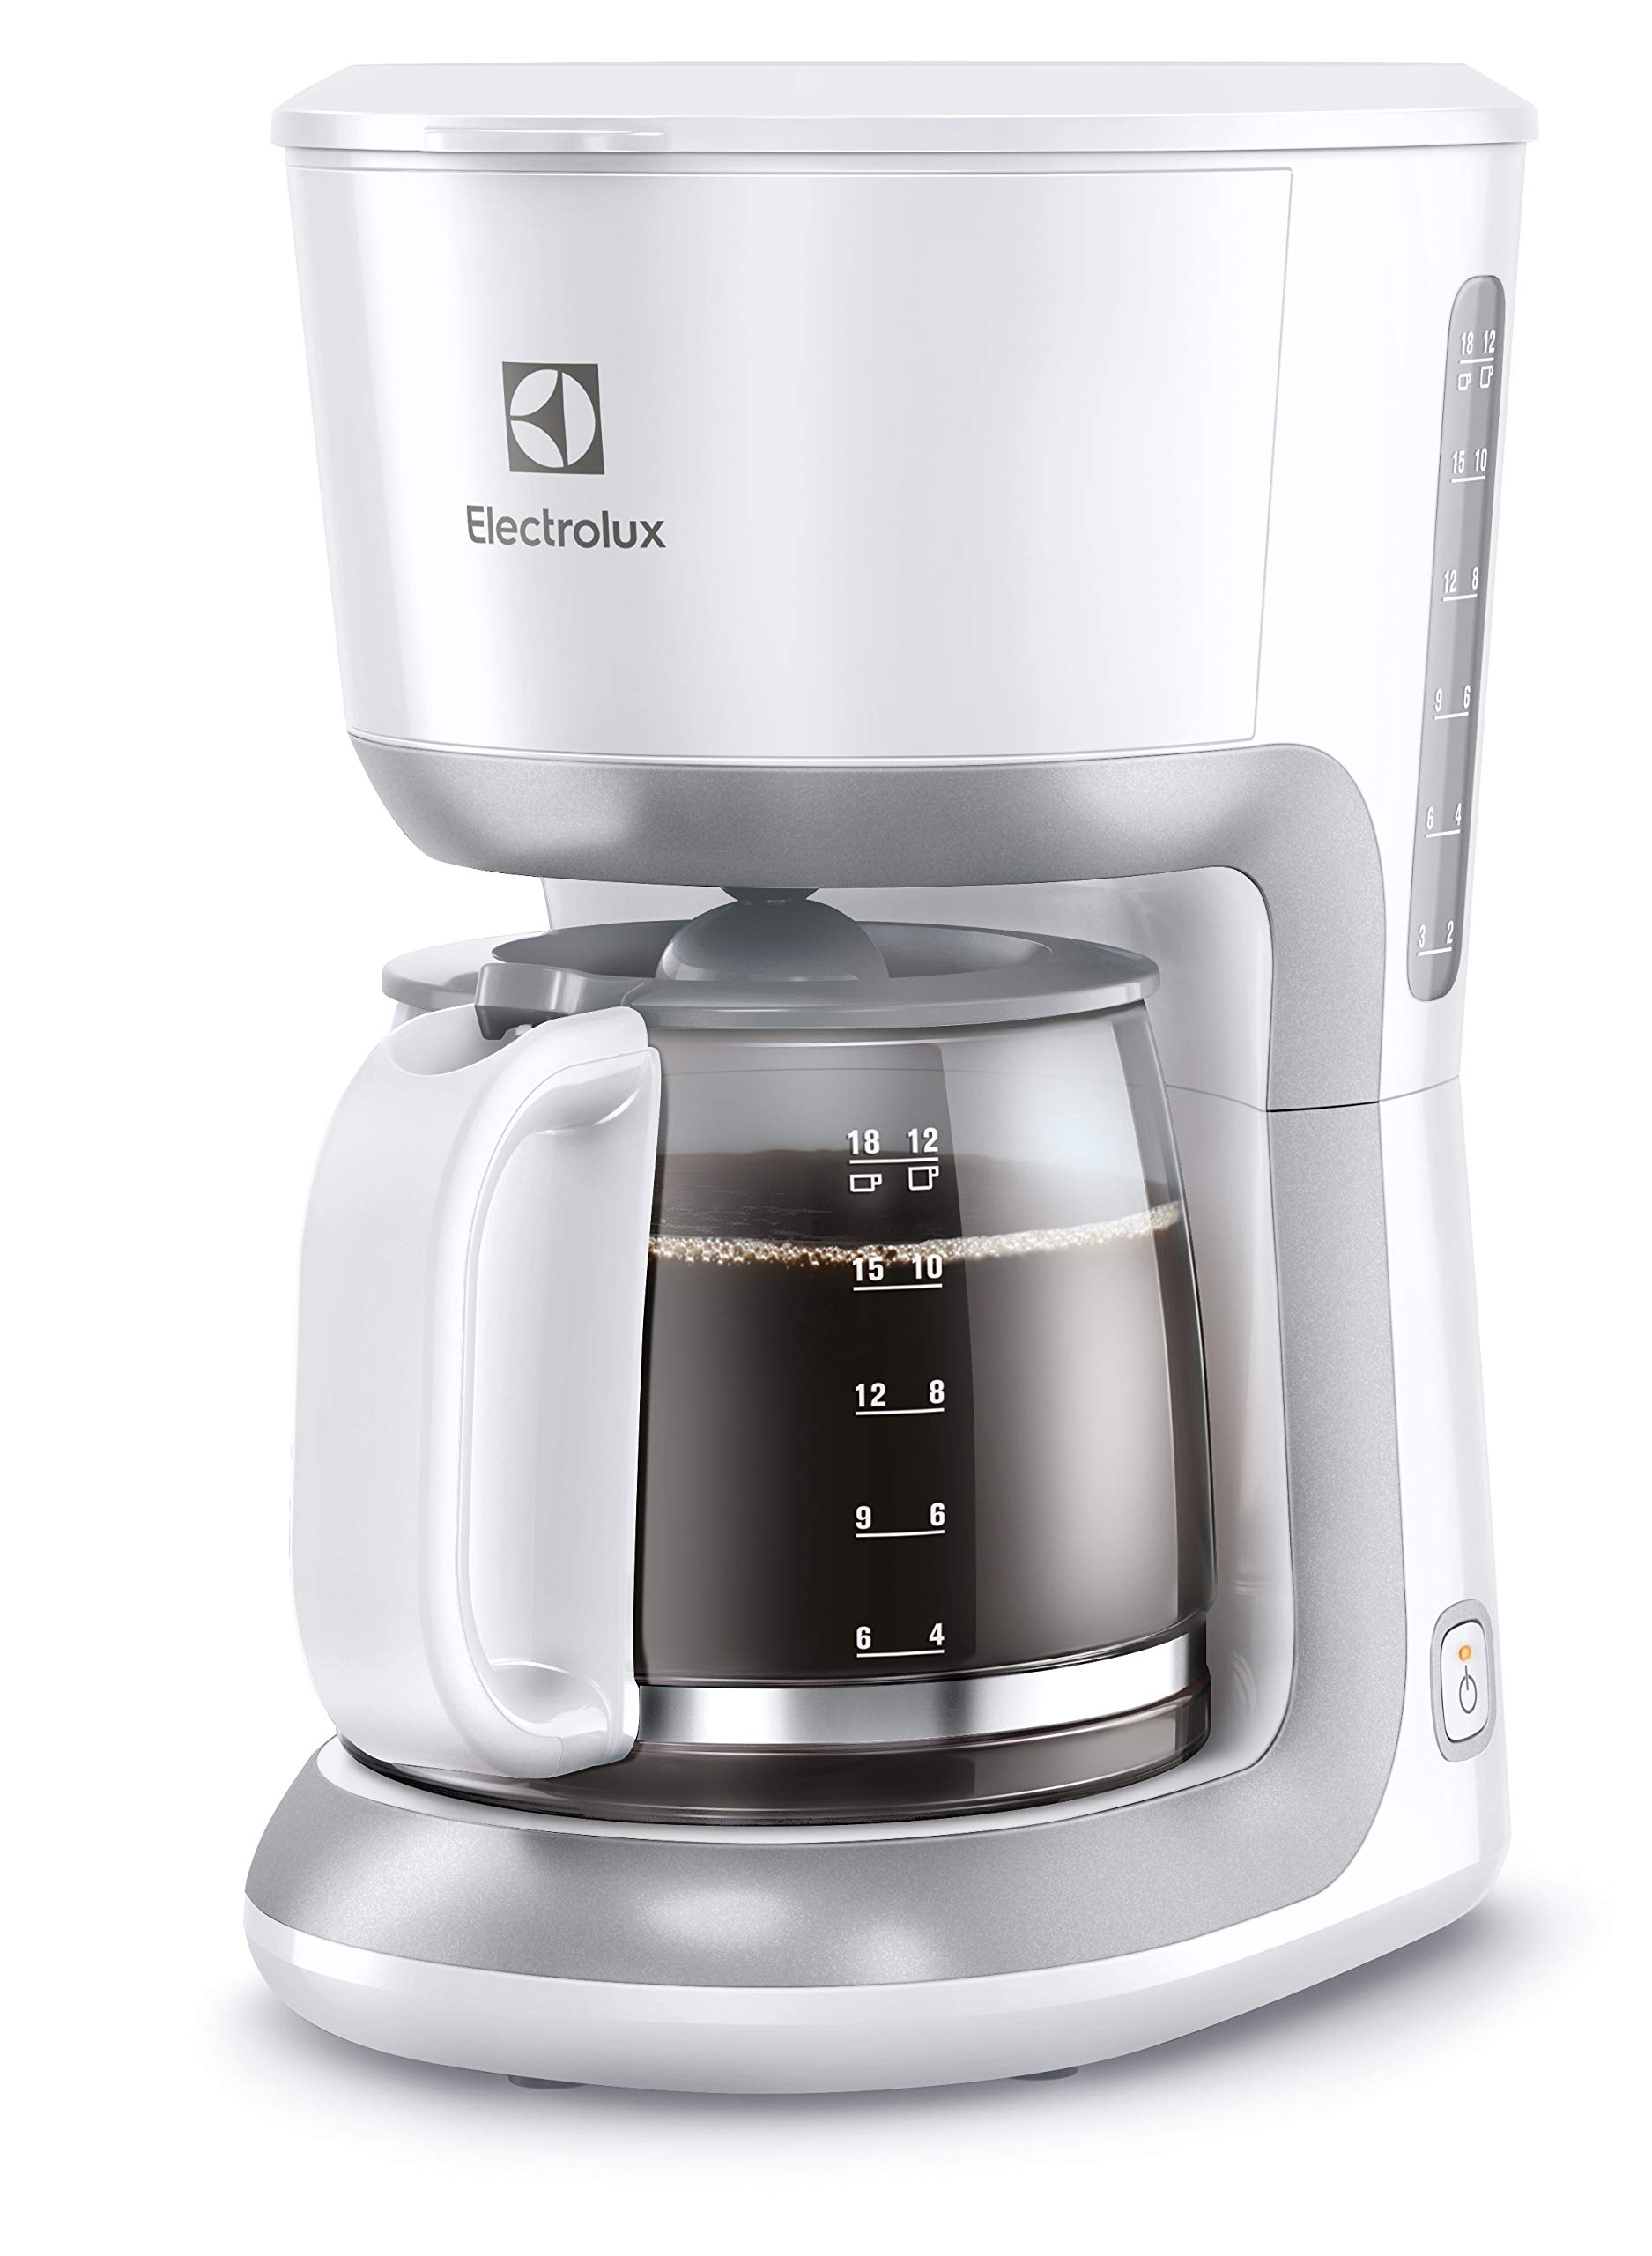 Electrolux máquina de café americano Bianco: Amazon.es: Hogar